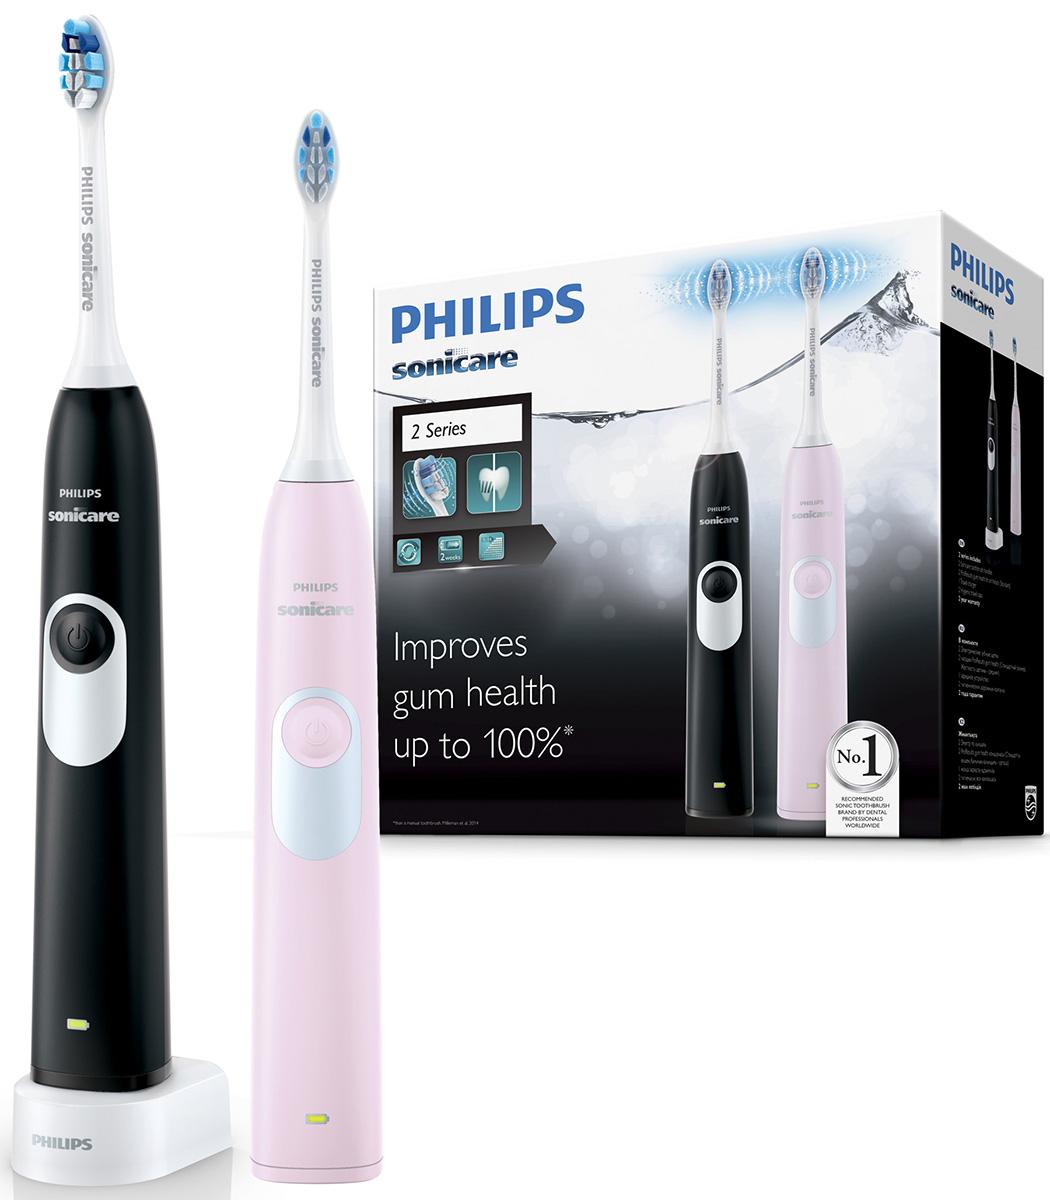 Philips Sonicare HX6232/41 набор из двух электрических зубных щеток